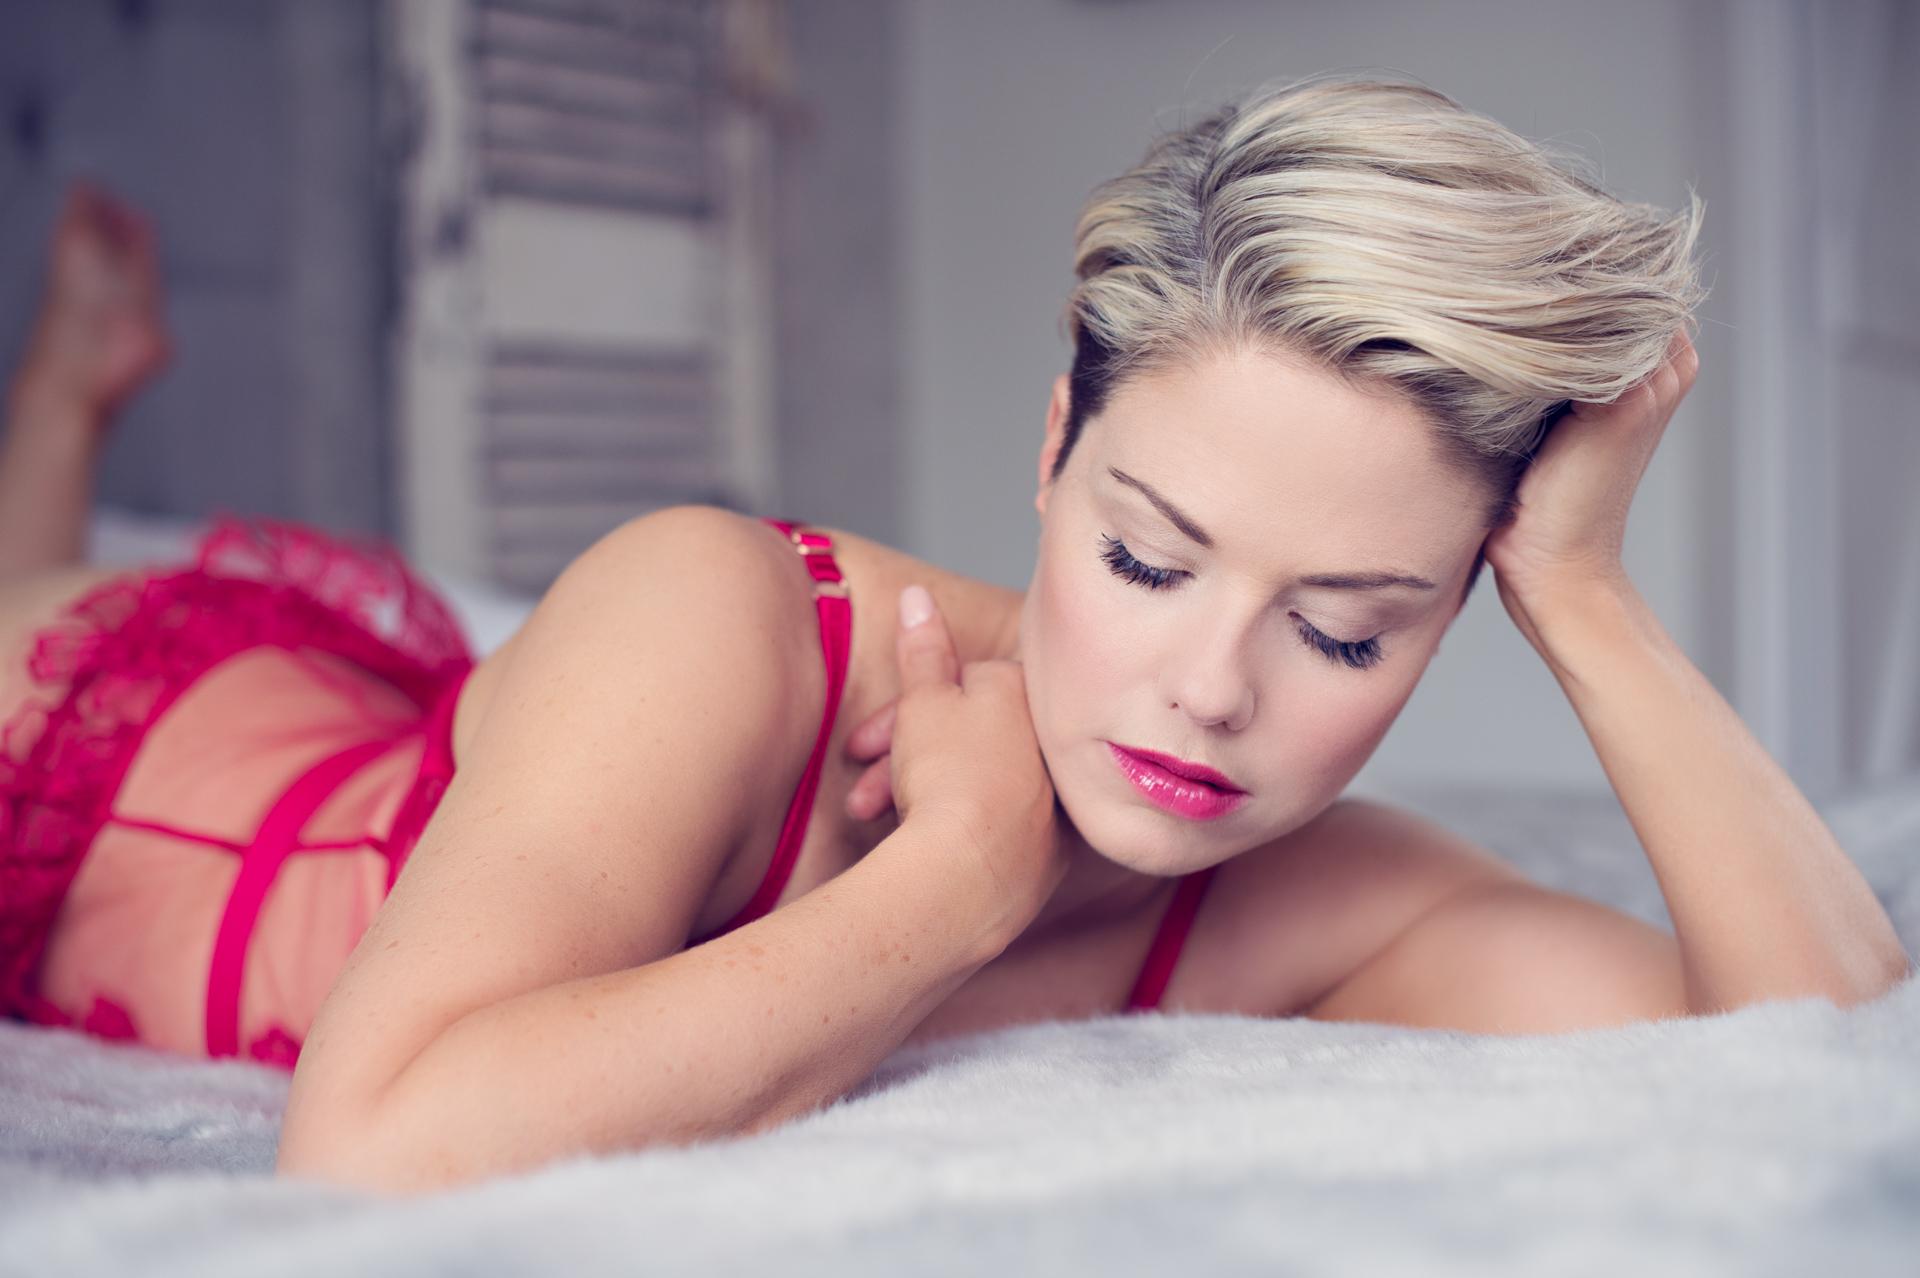 https://katehopewellsmith.com/wp-content/uploads/boudoir-photography-inspiration-kate-hopewell-smith-9.jpg